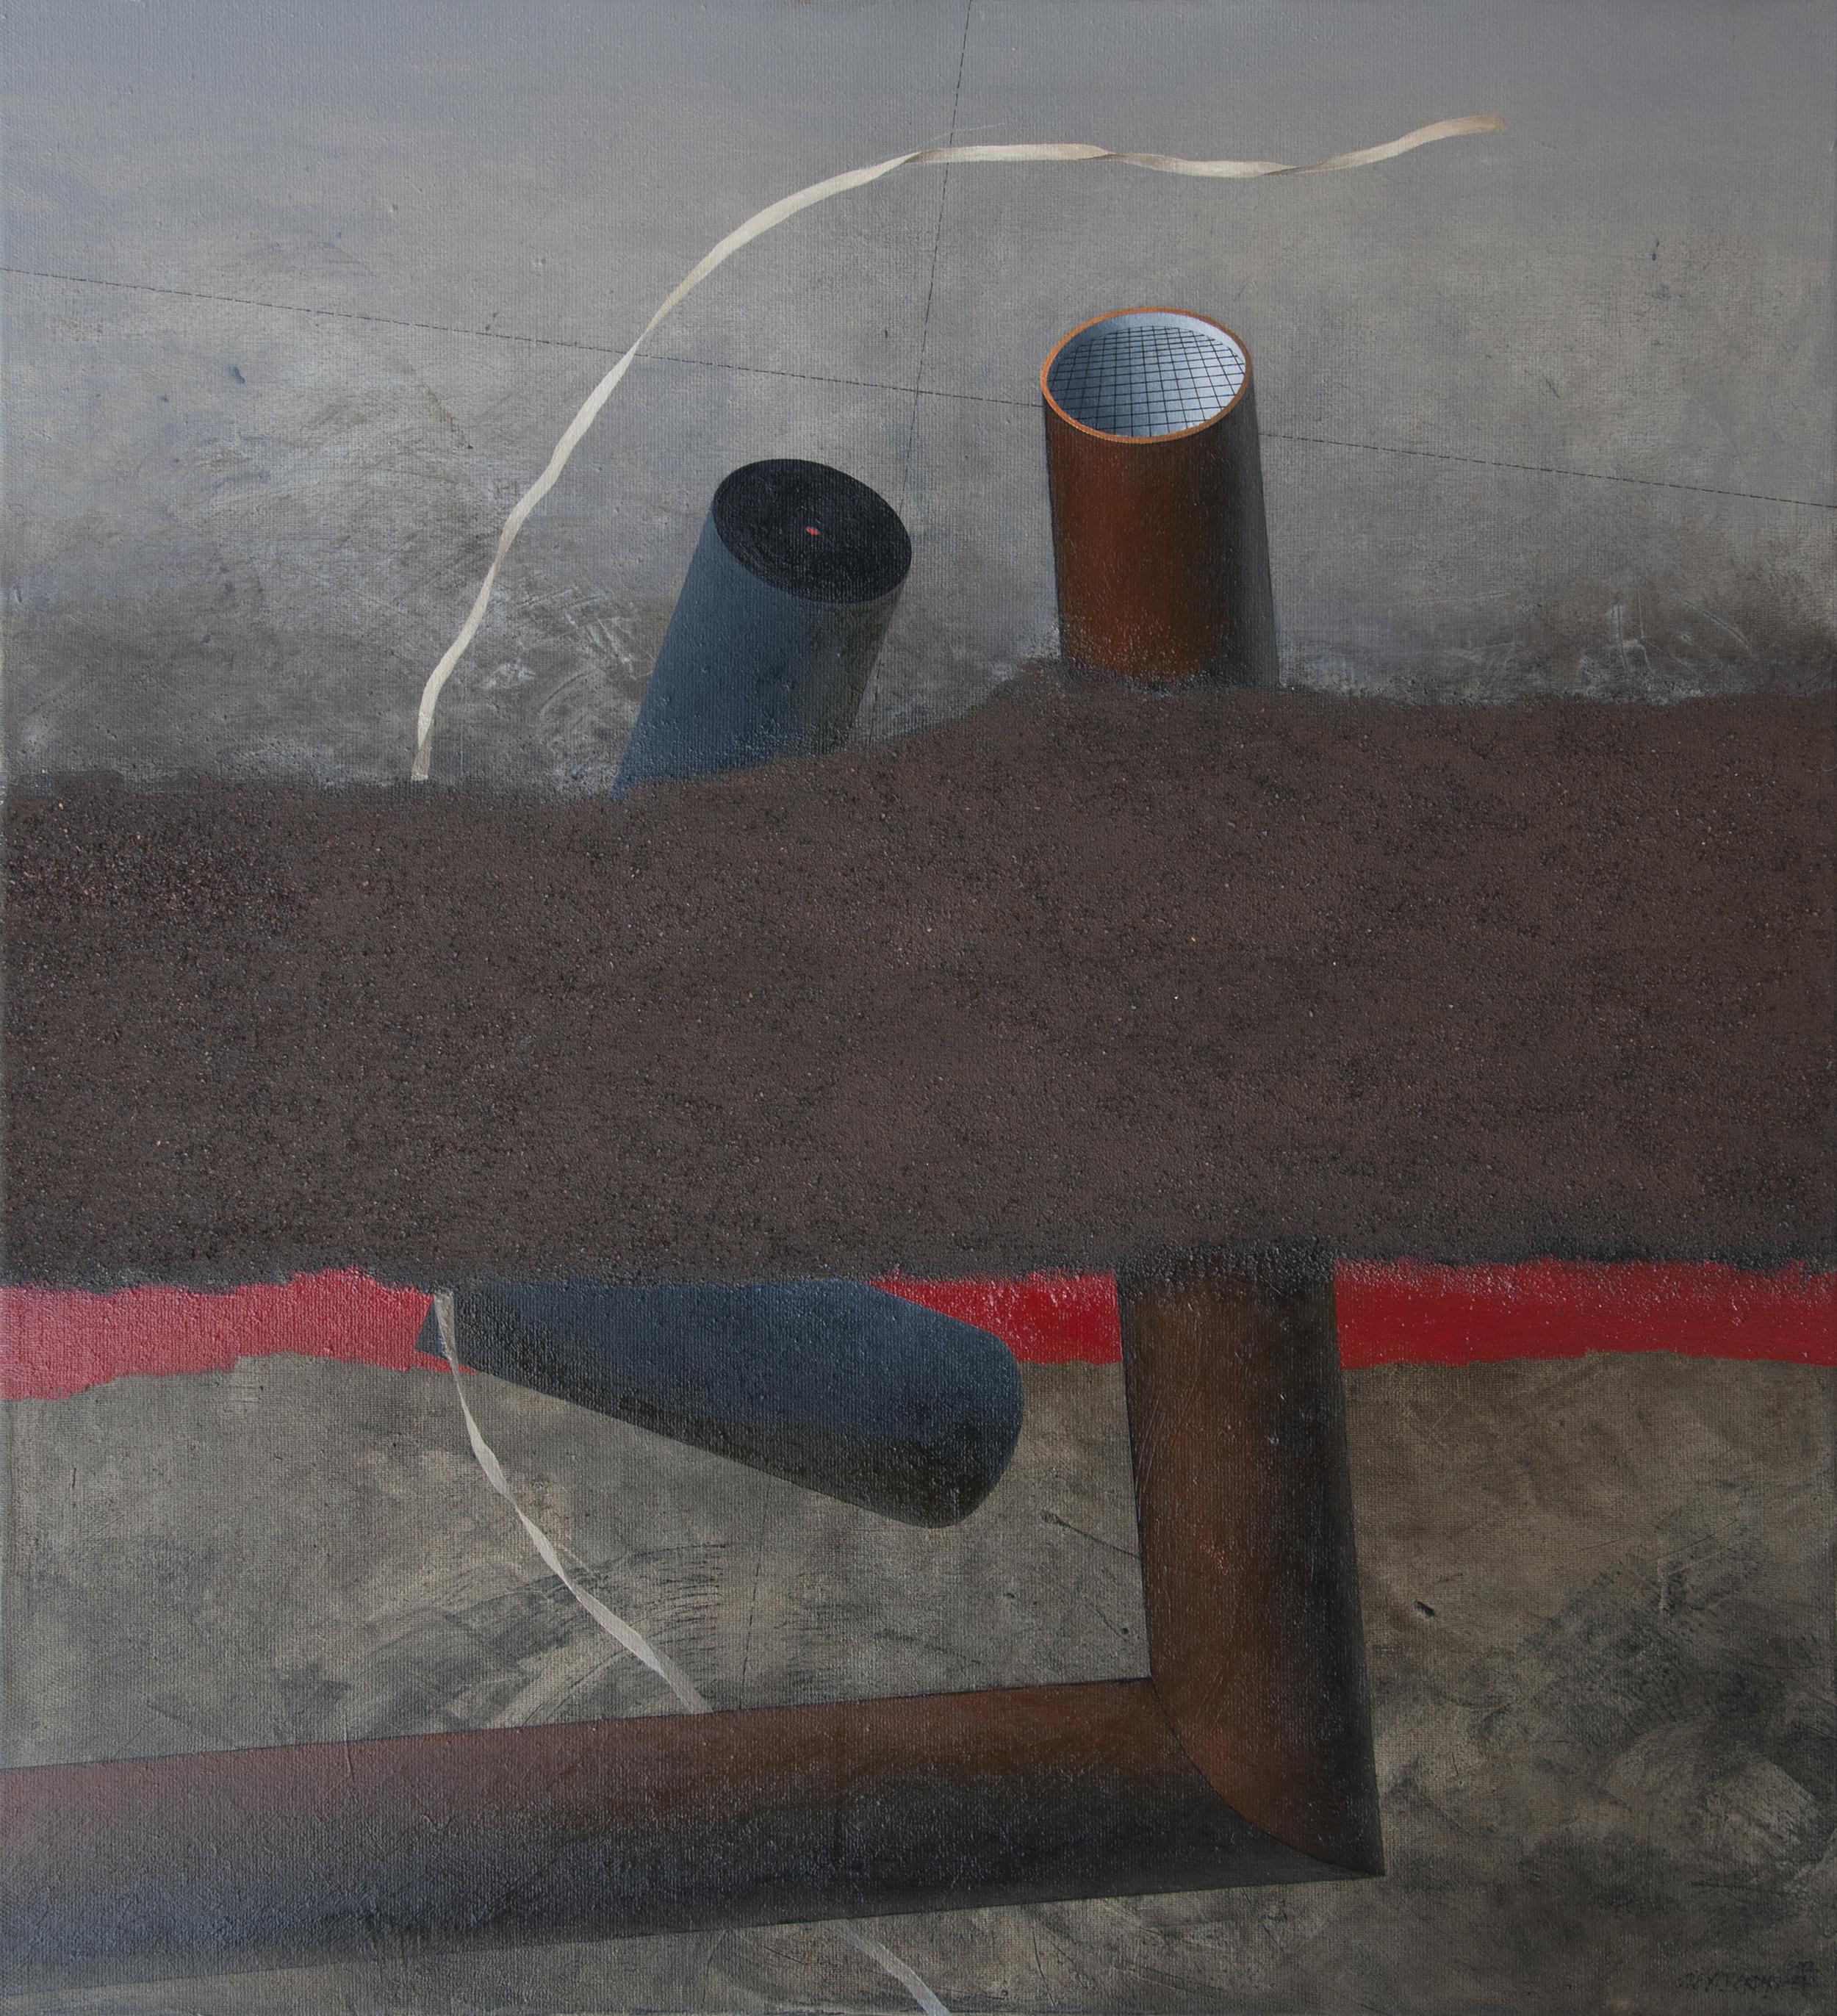 Outlook, oil on canvas, 120x110 cm, 2012